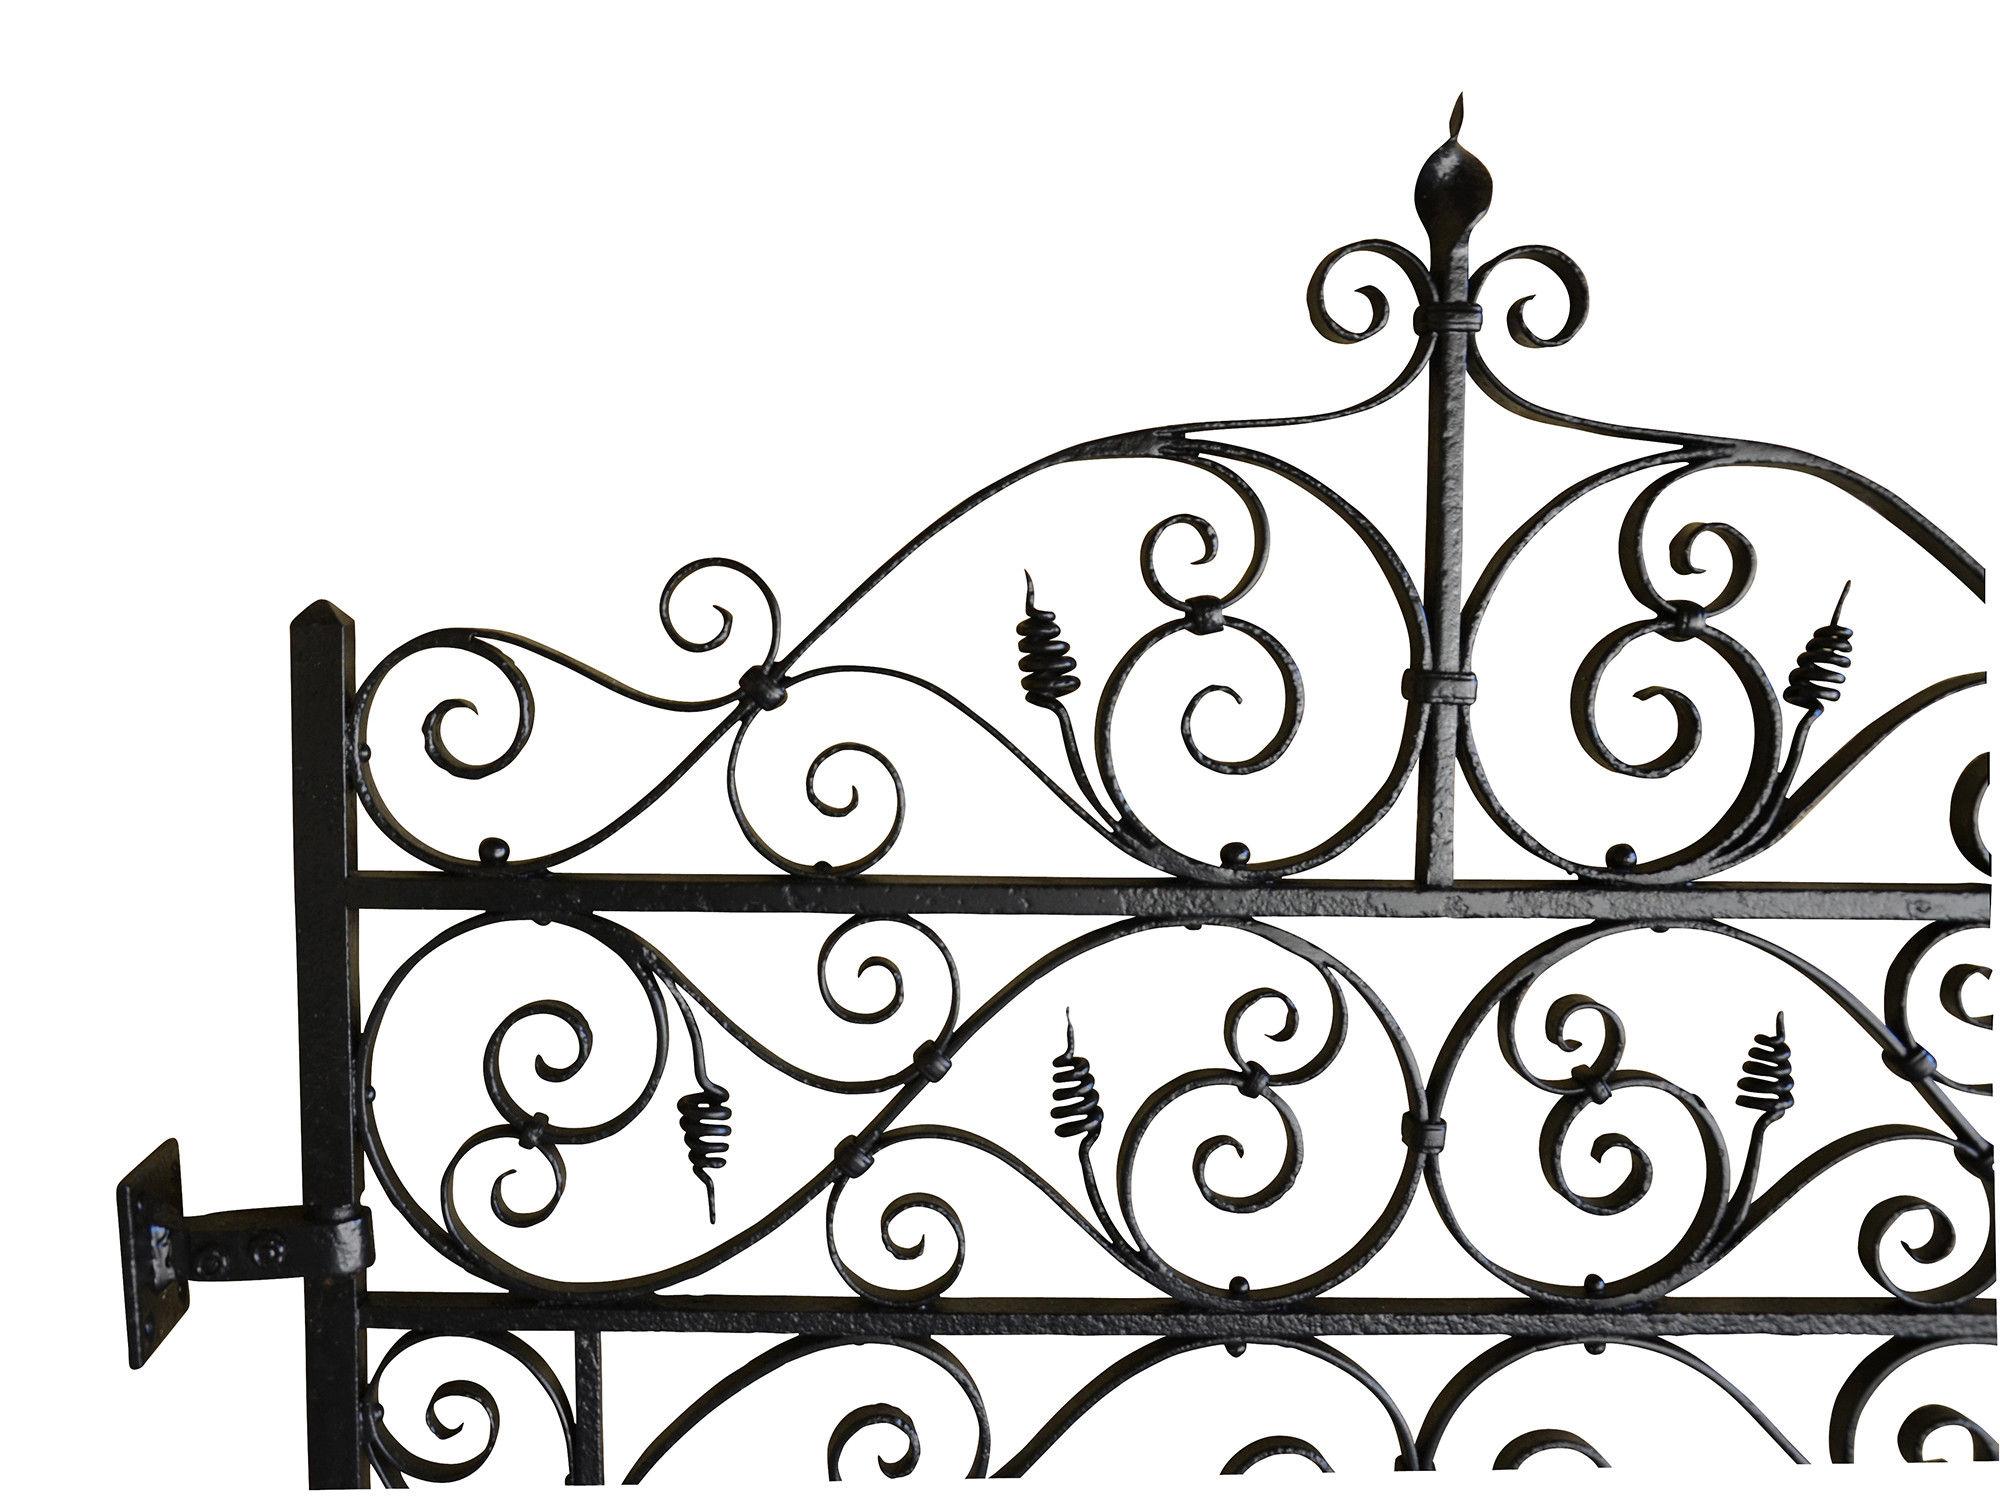 2000x1500 A Late 19th Century Wrought Iron Garden Gate